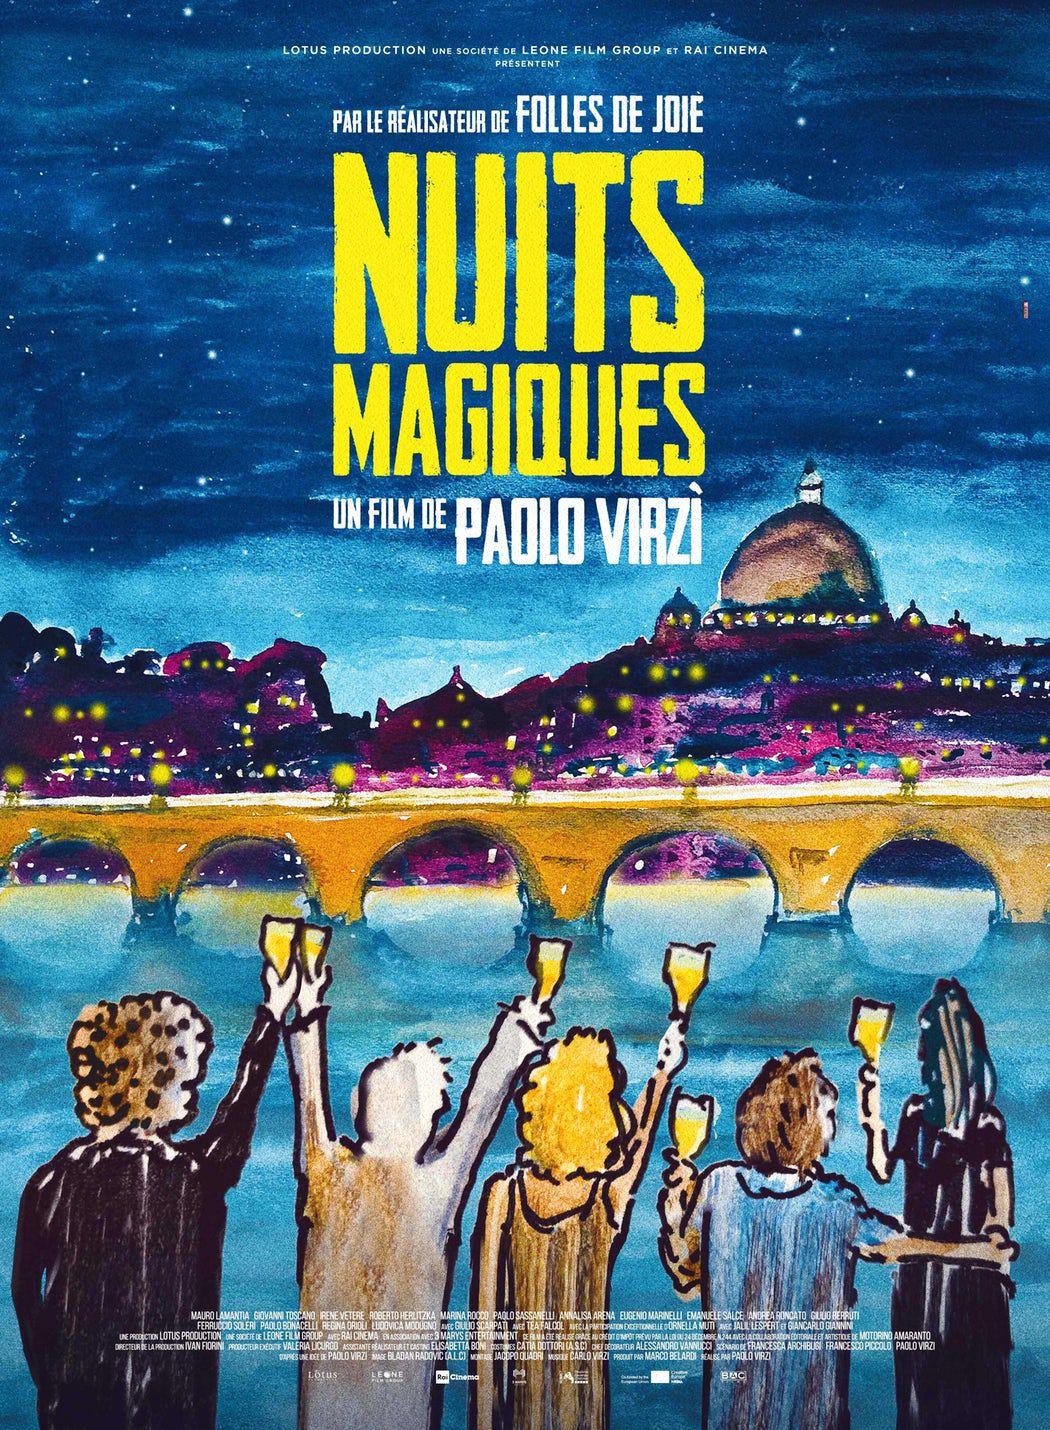 Nuits magiques - Film (2019)